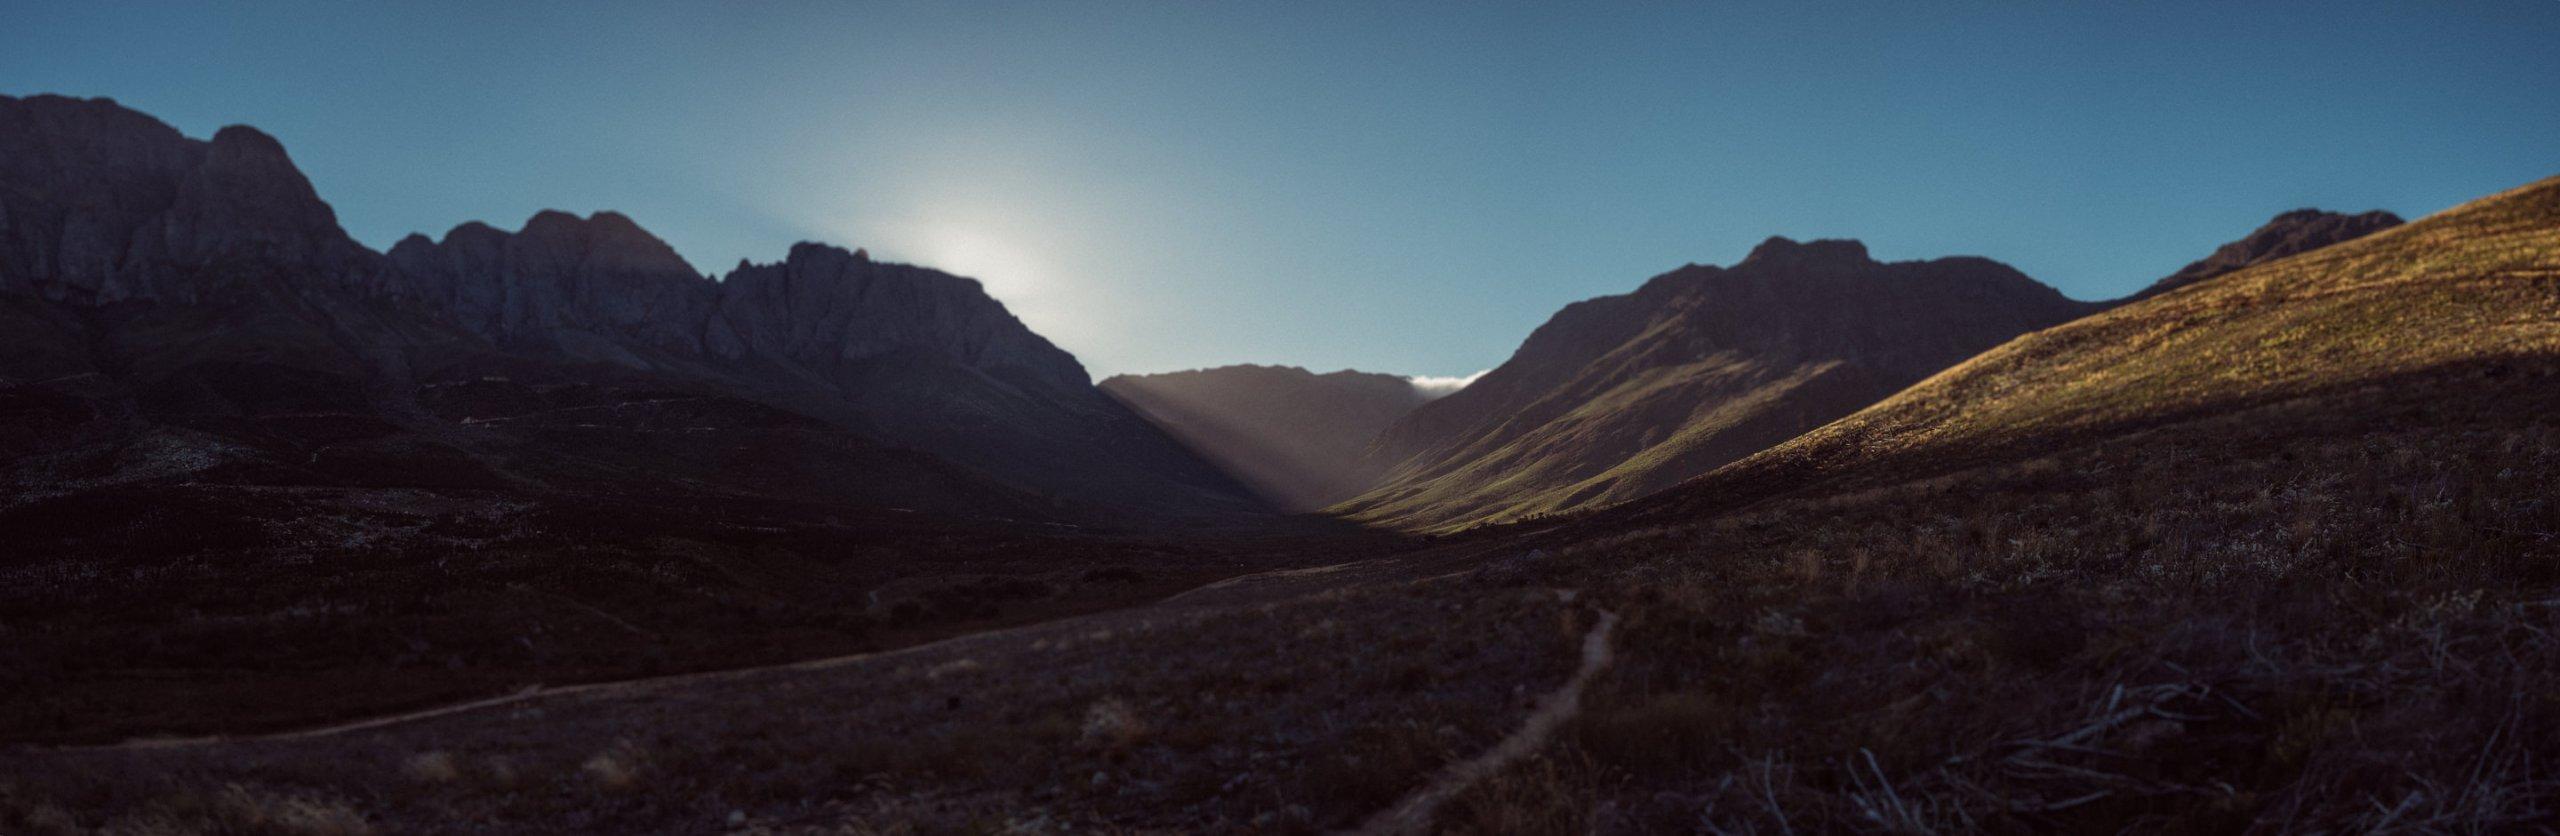 Johannes-Maur-Panorama-Fotografie-South-Africa_2